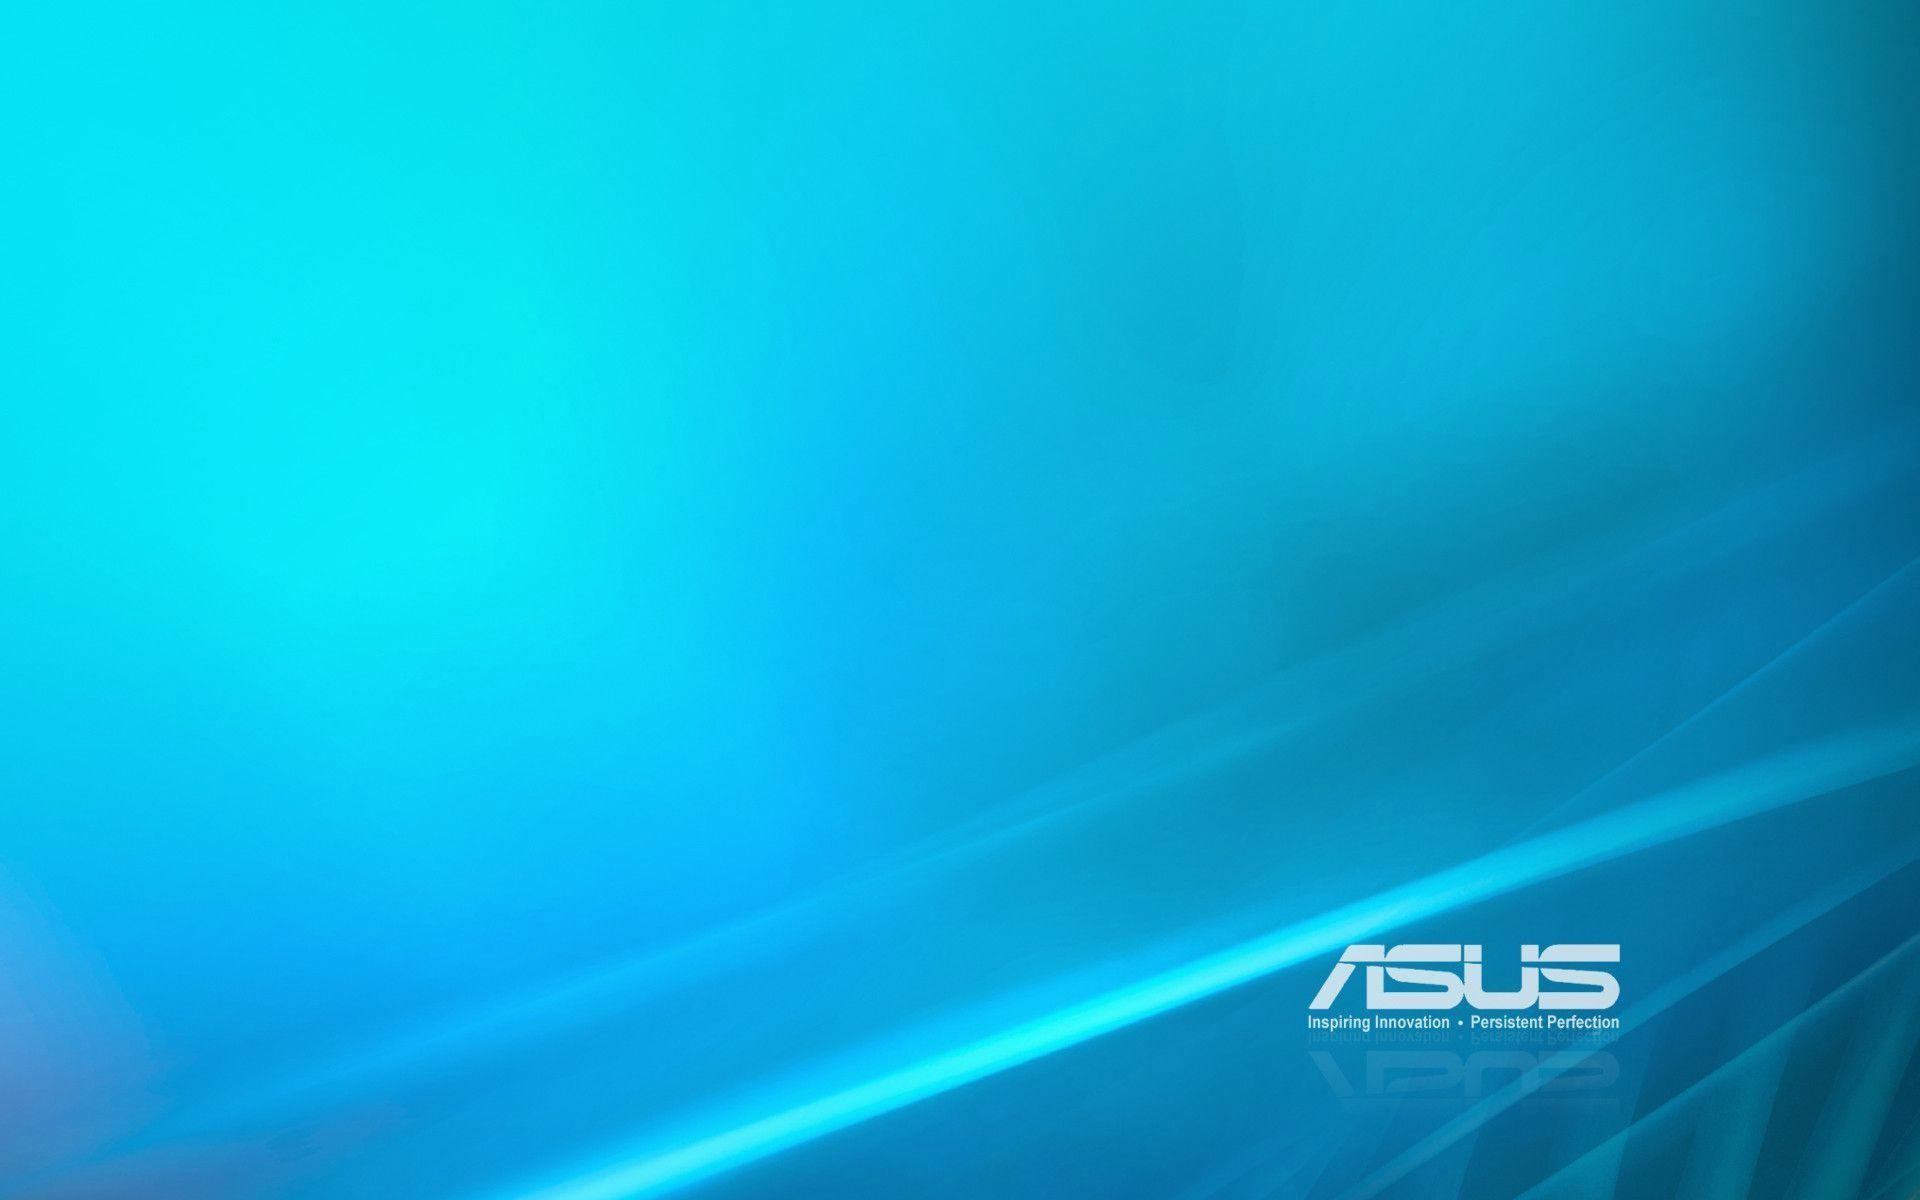 Downlaod-Asus-Wallpapers-HD